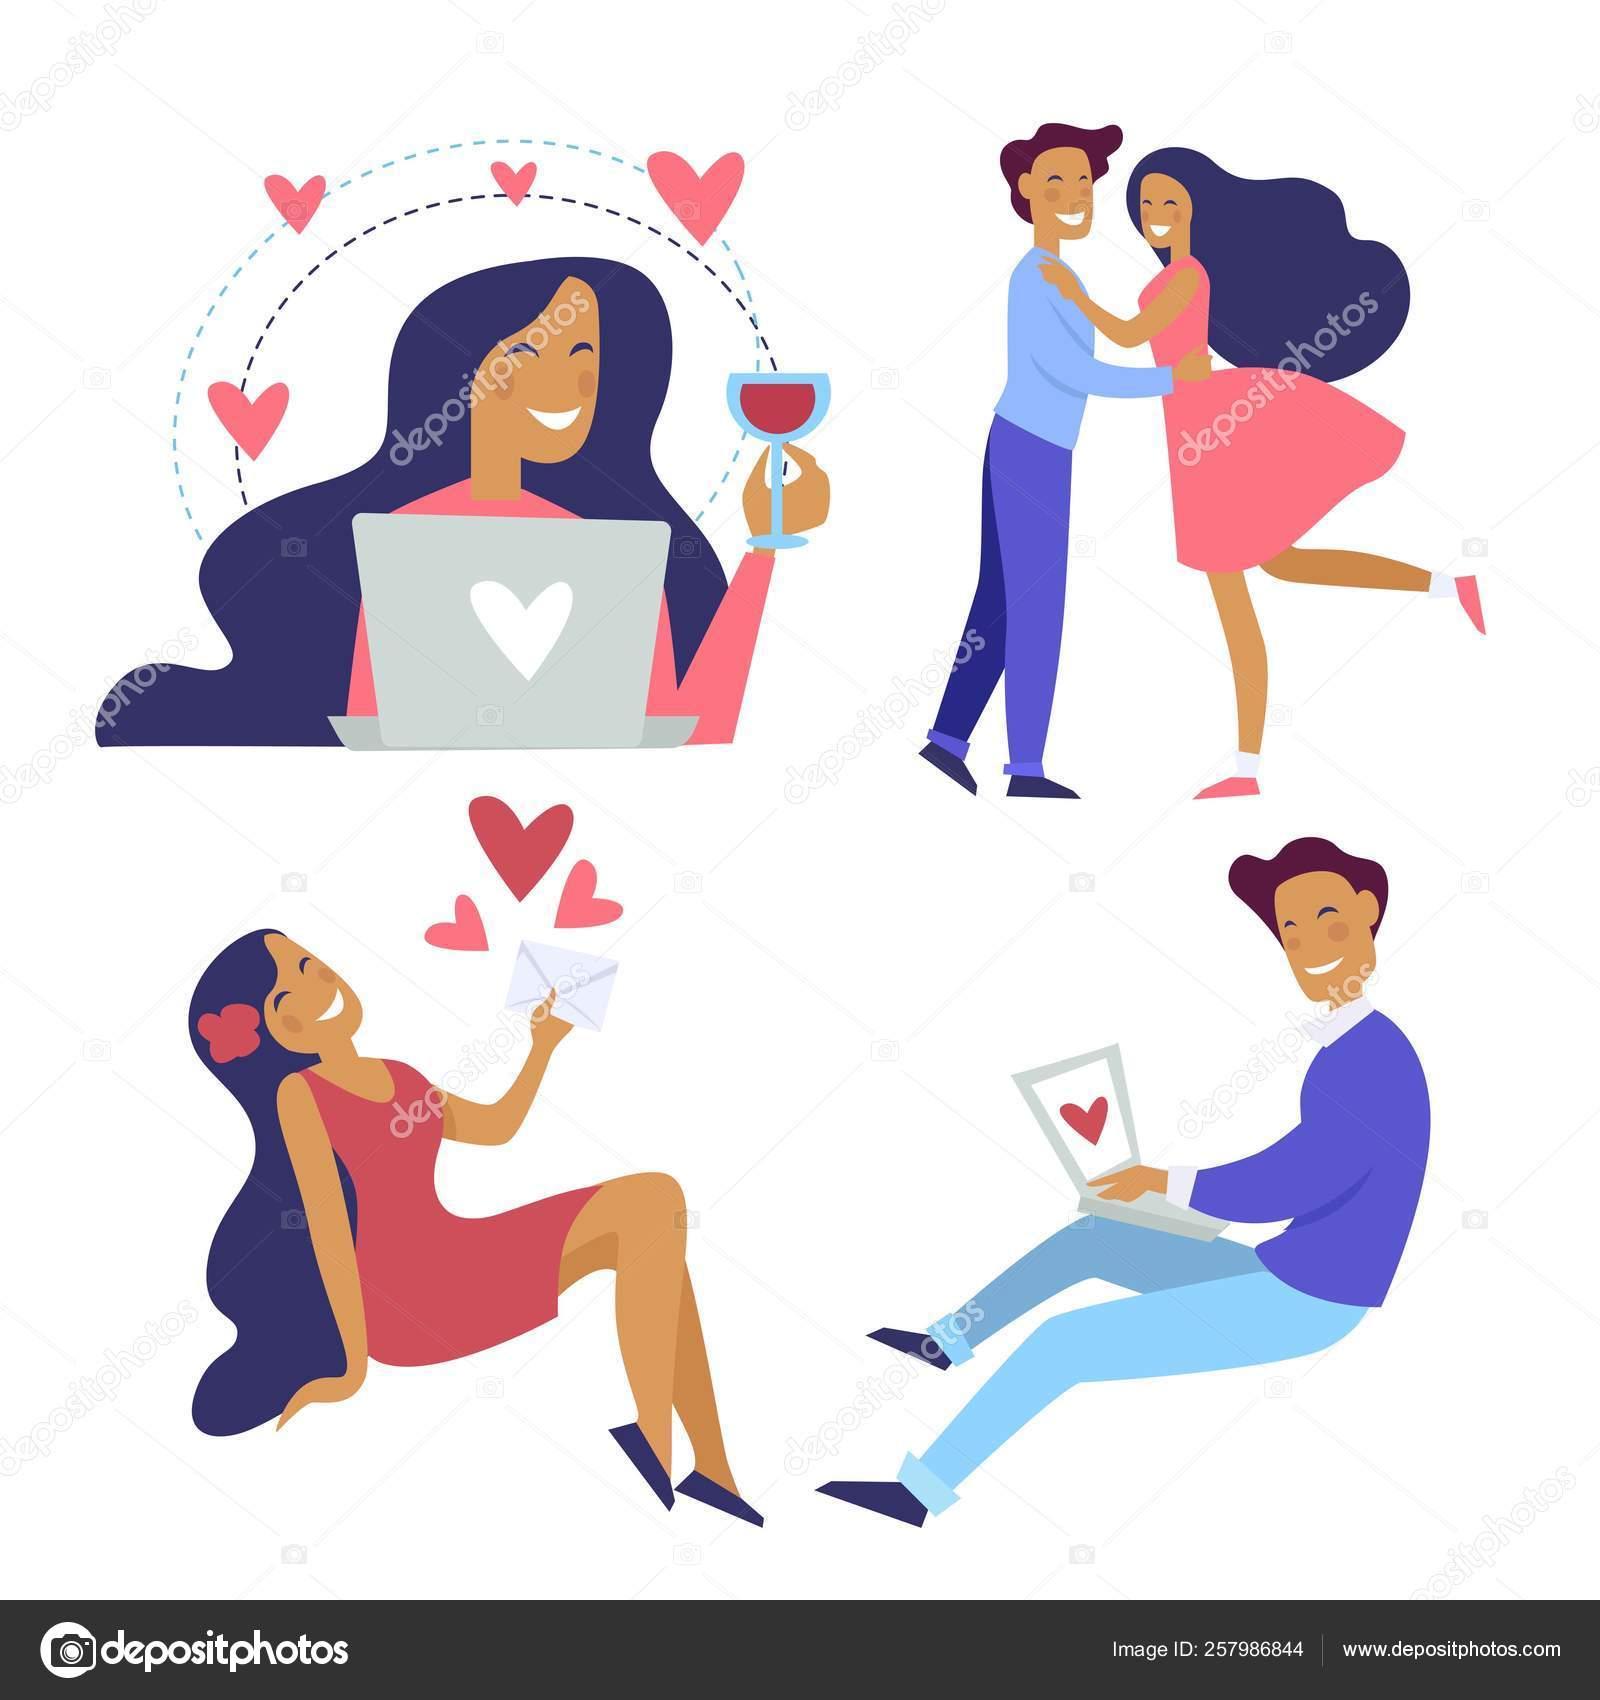 Scharnier dating vragen